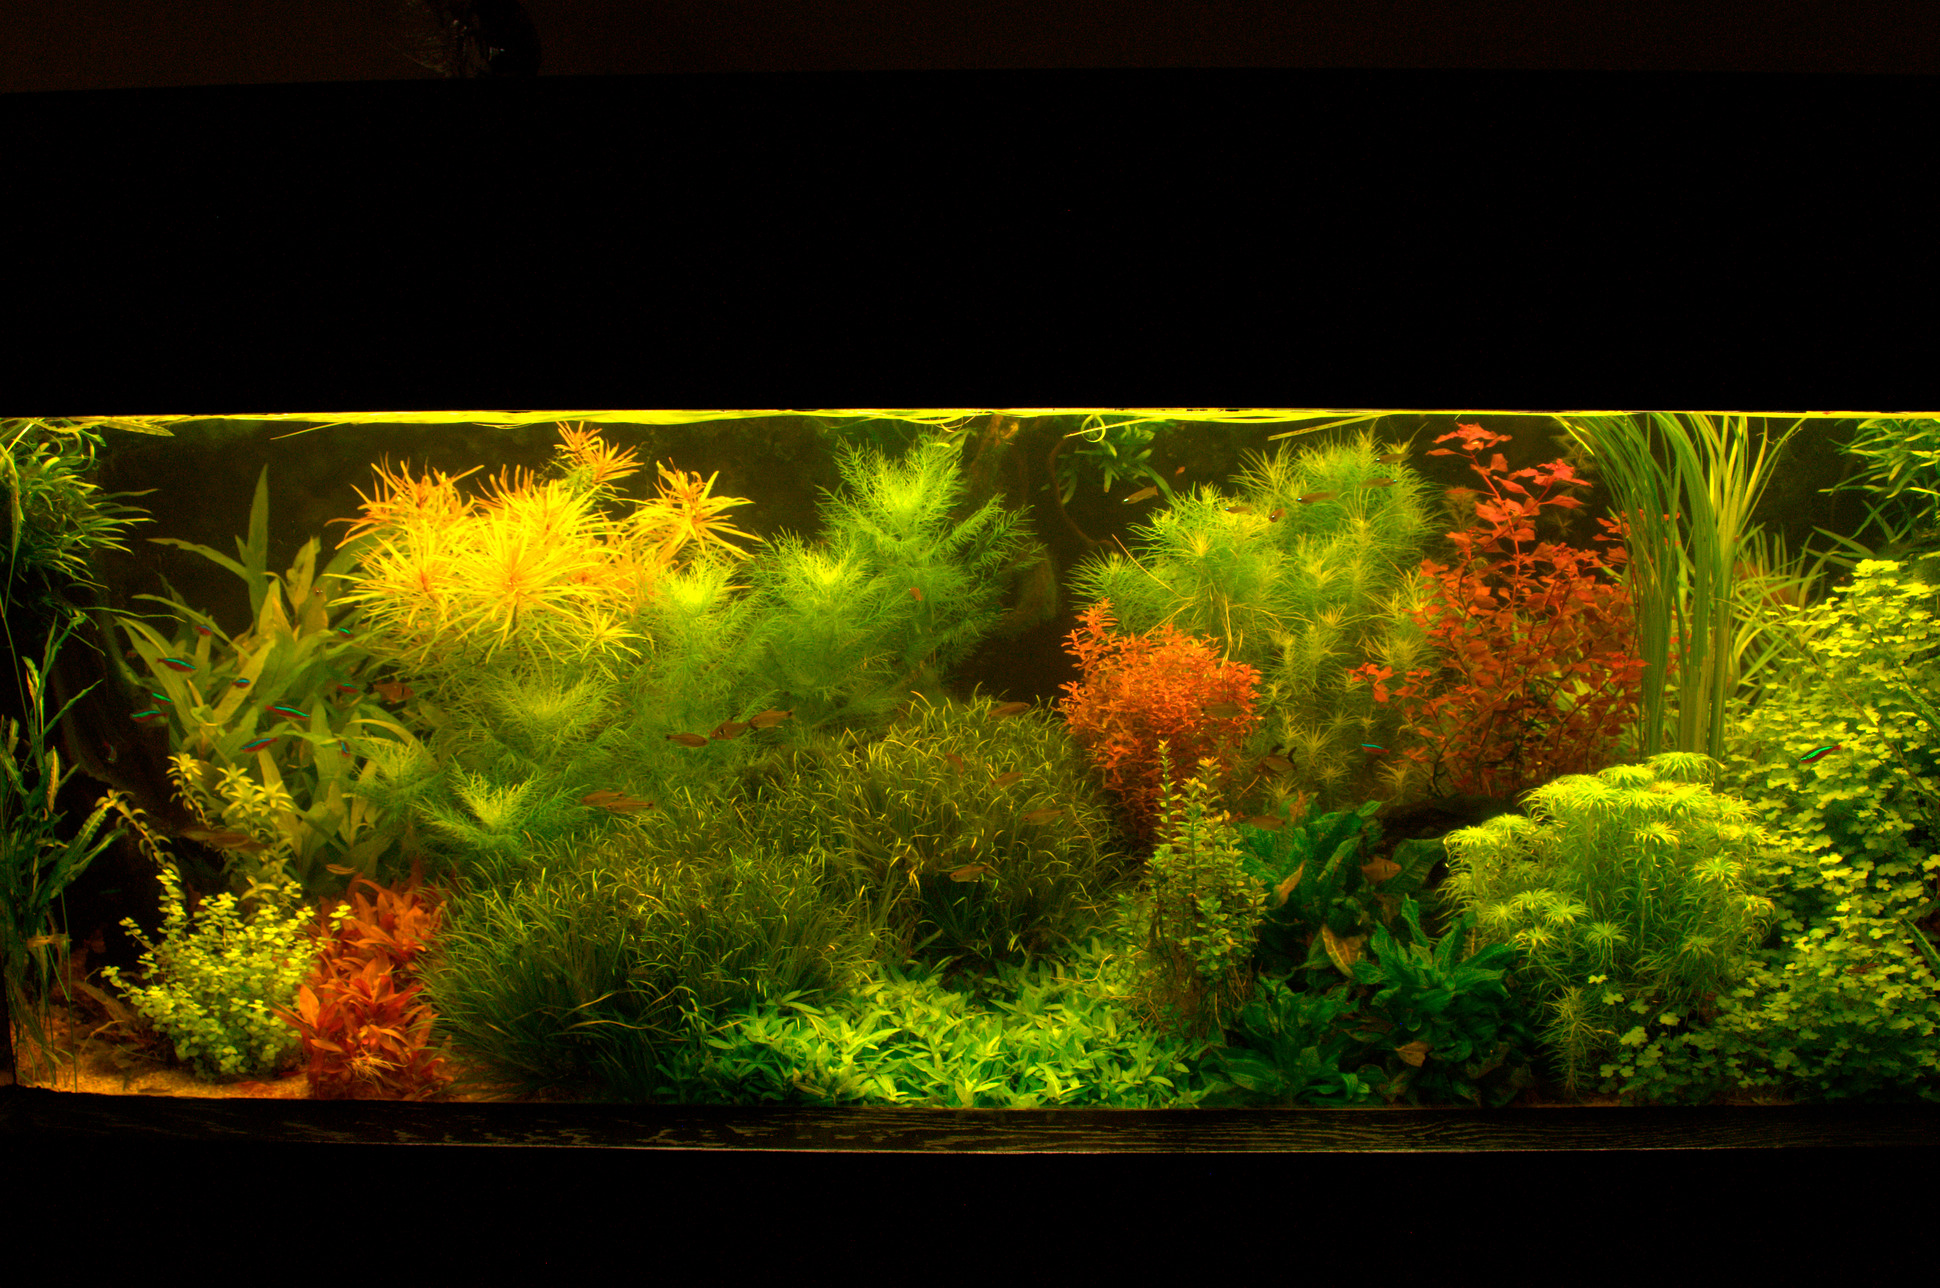 aquarium besatz rechner tobi s flussufer panorama flowgrow aquascape aquarien datenbank die. Black Bedroom Furniture Sets. Home Design Ideas